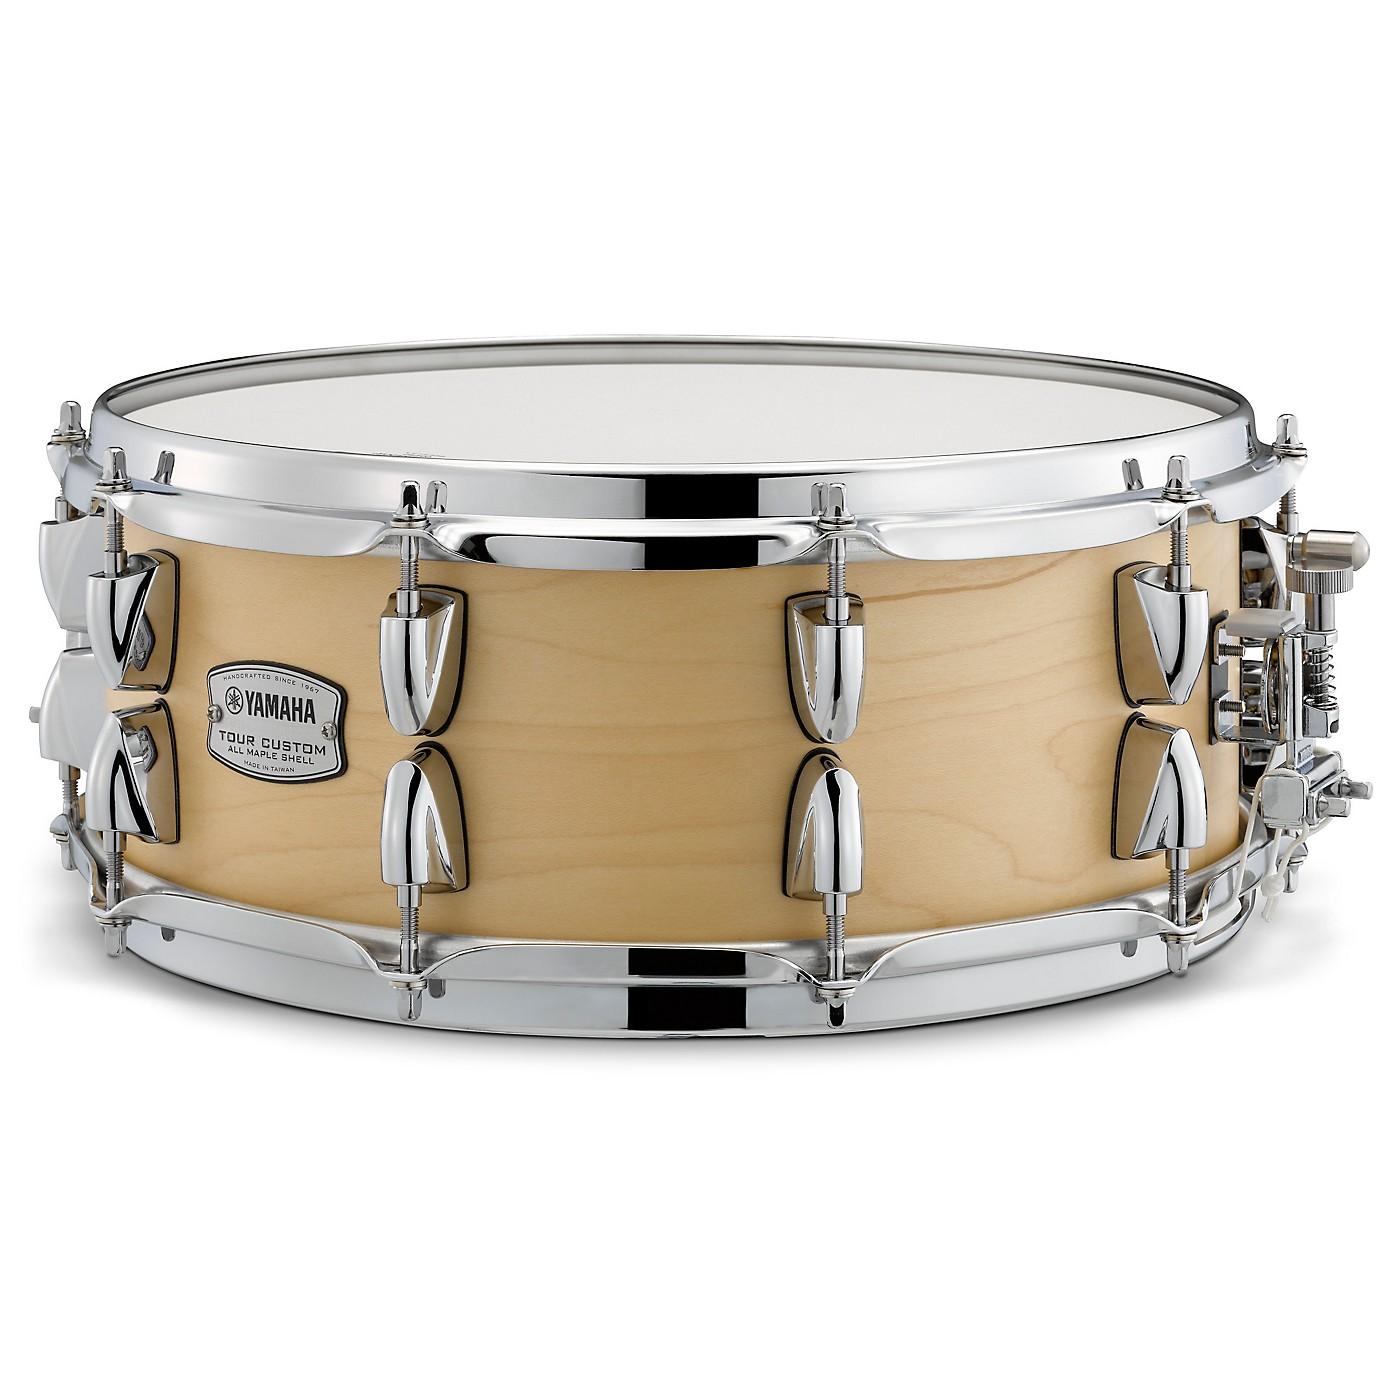 Yamaha Tour Custom Maple Snare Drum thumbnail